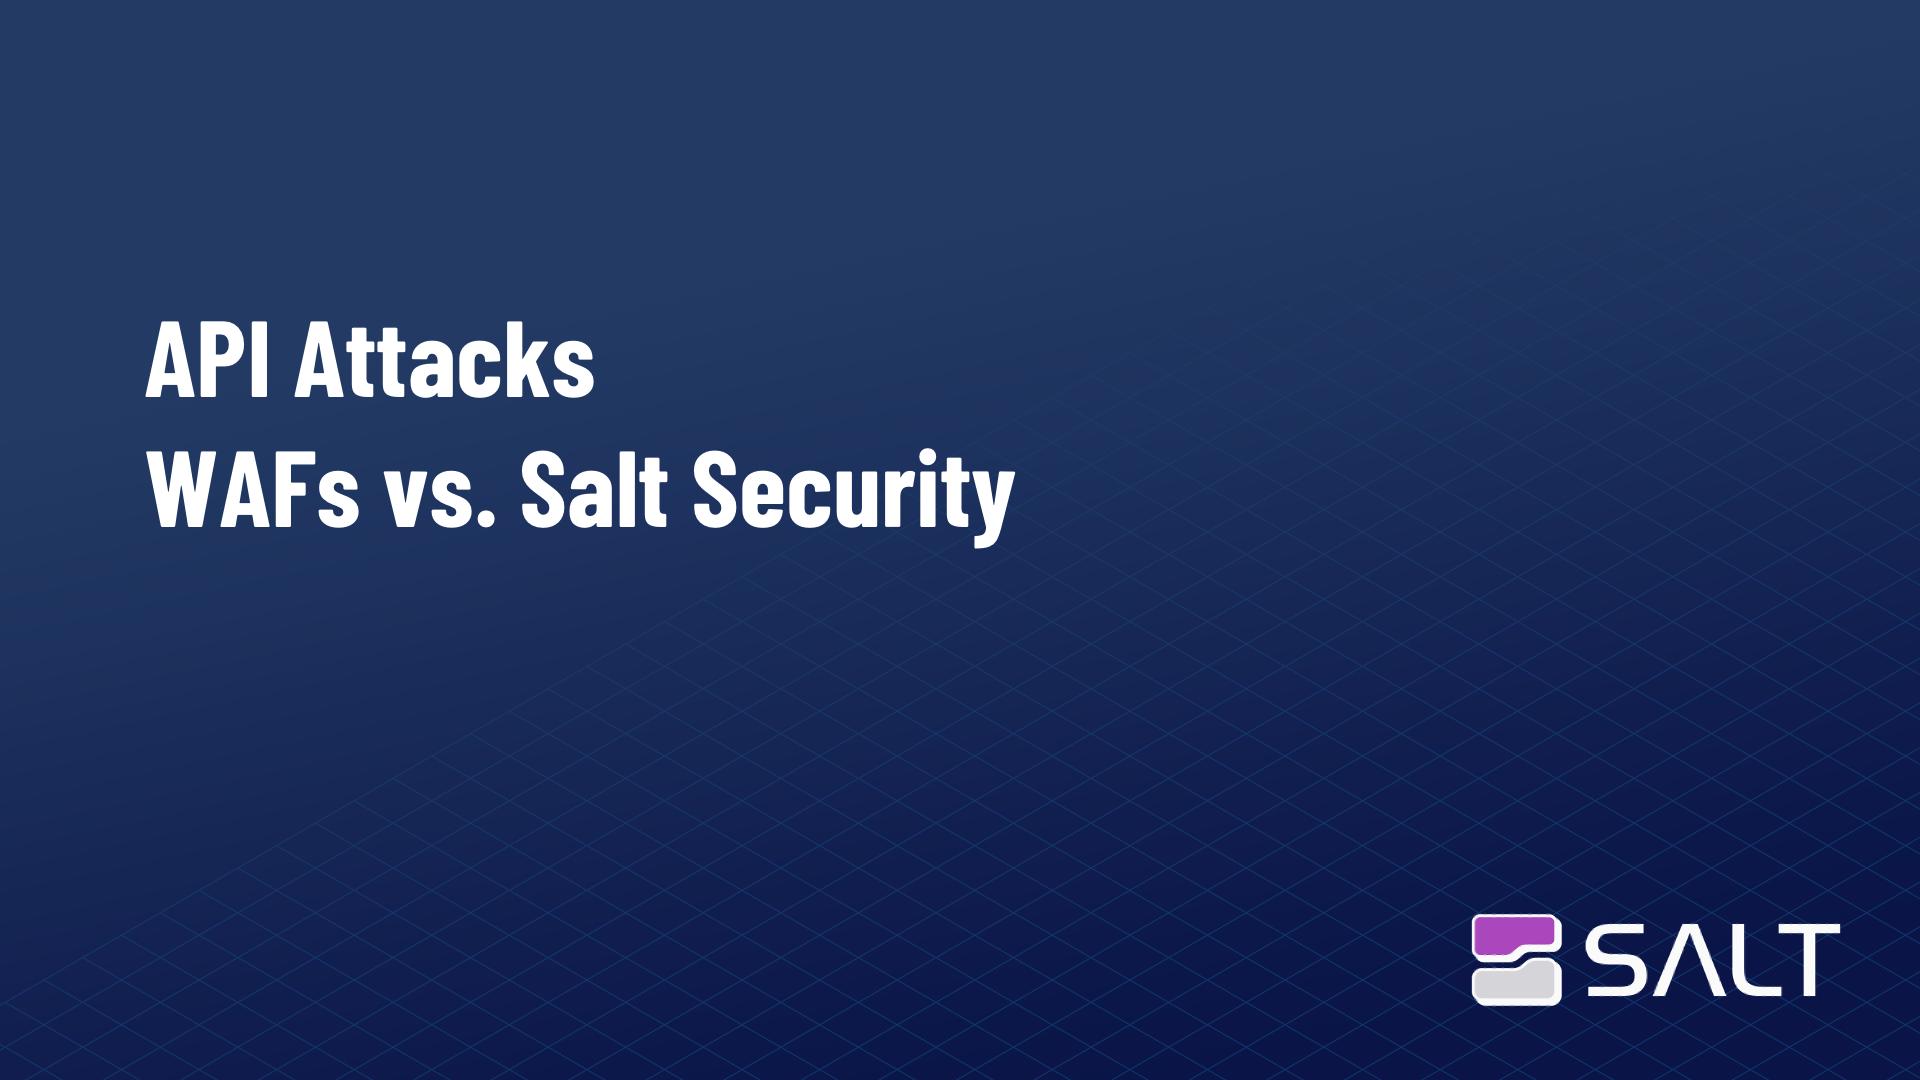 API Attacks - WAFs vs. Salt Security